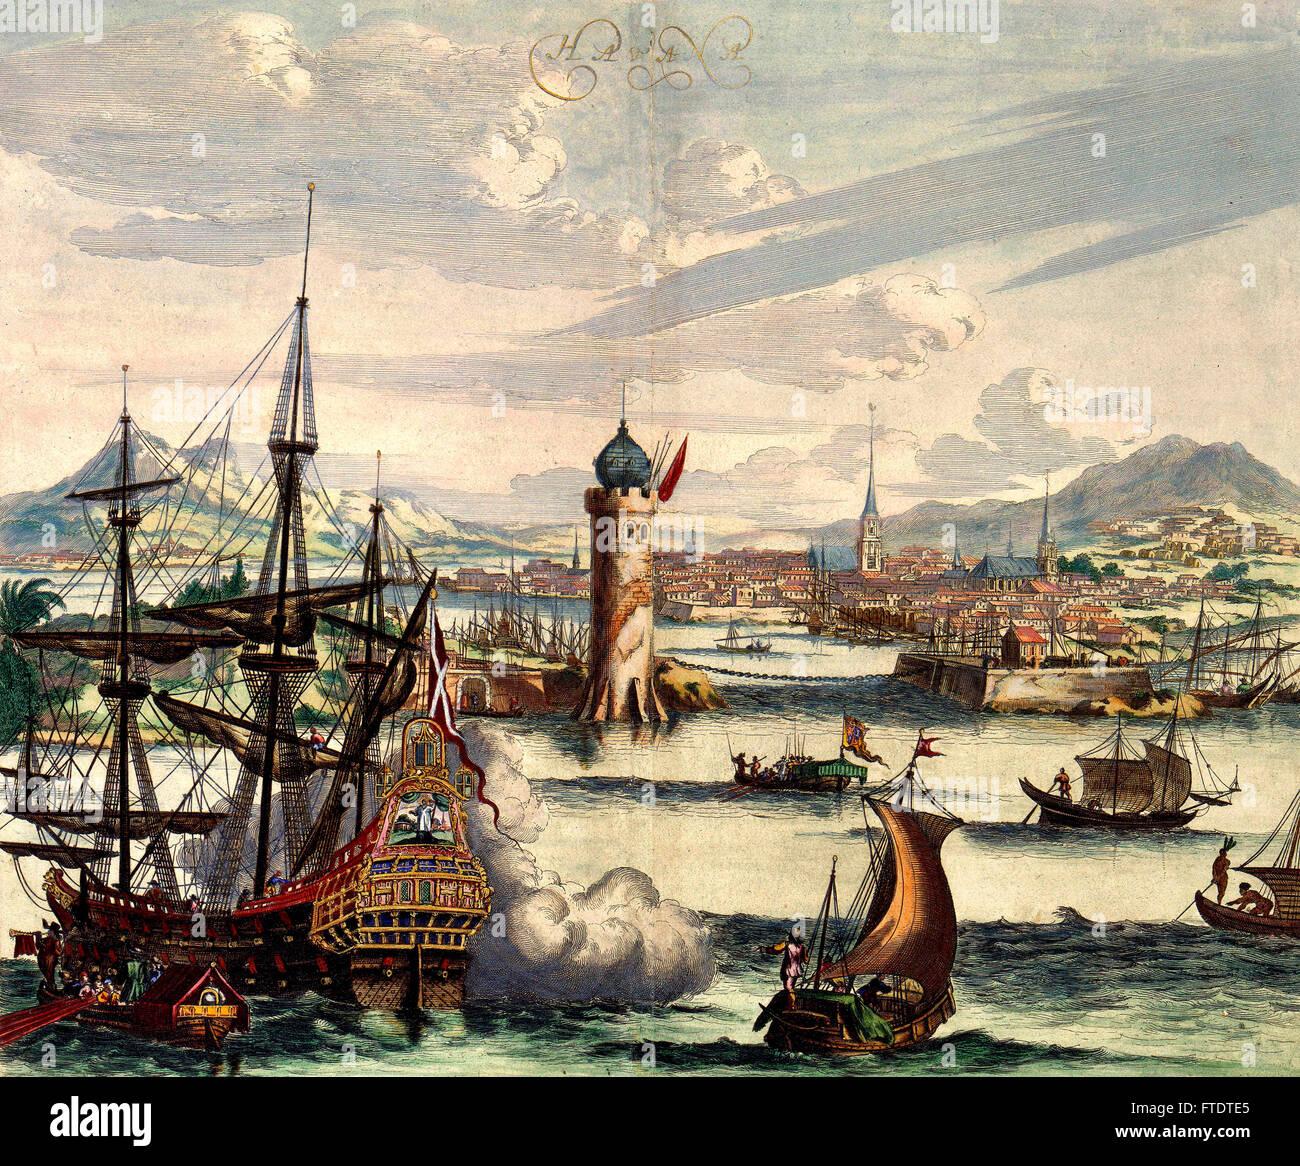 17th century depiction of Havana, Cuba - Stock Image